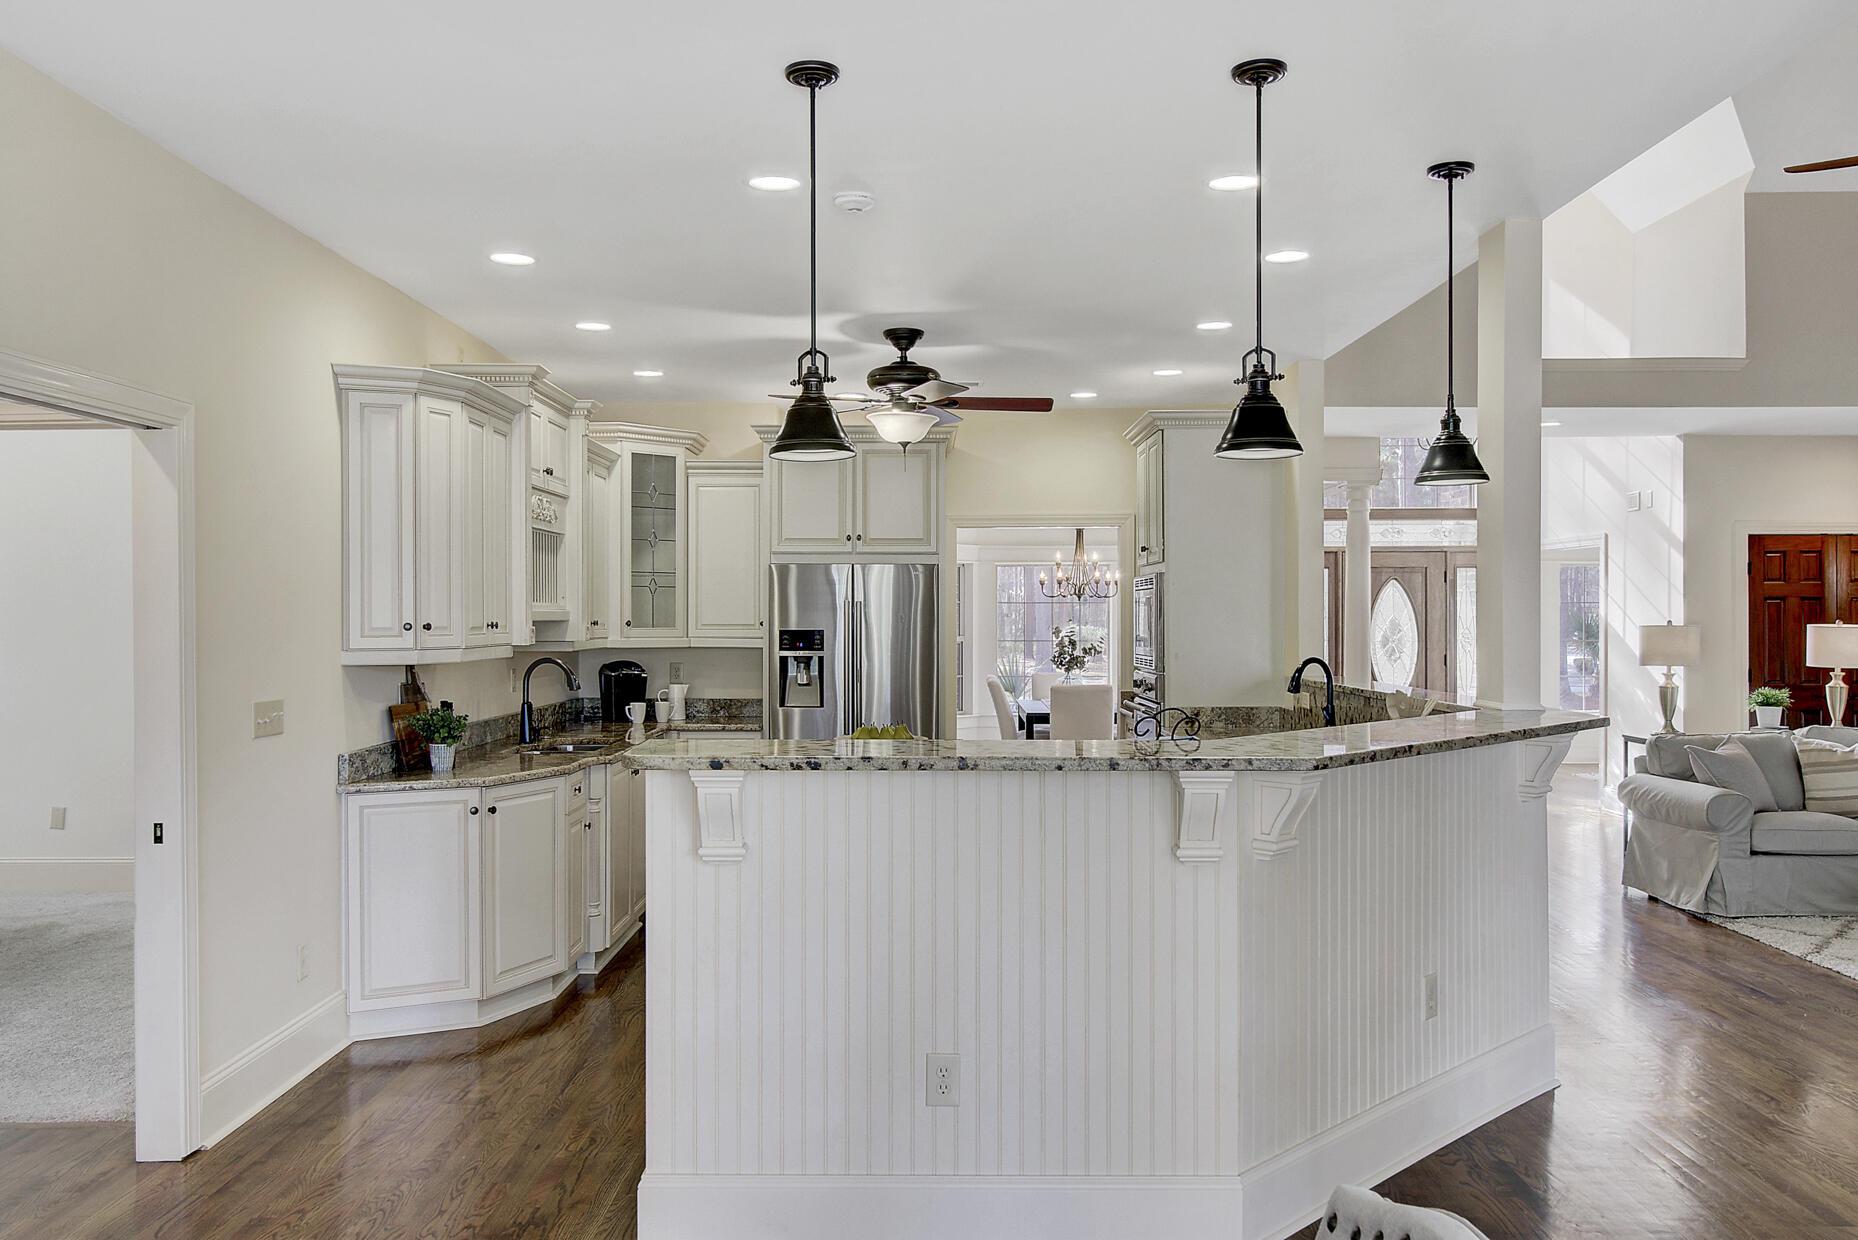 Dunes West Homes For Sale - 4123 Colonel Vanderhorst, Mount Pleasant, SC - 19